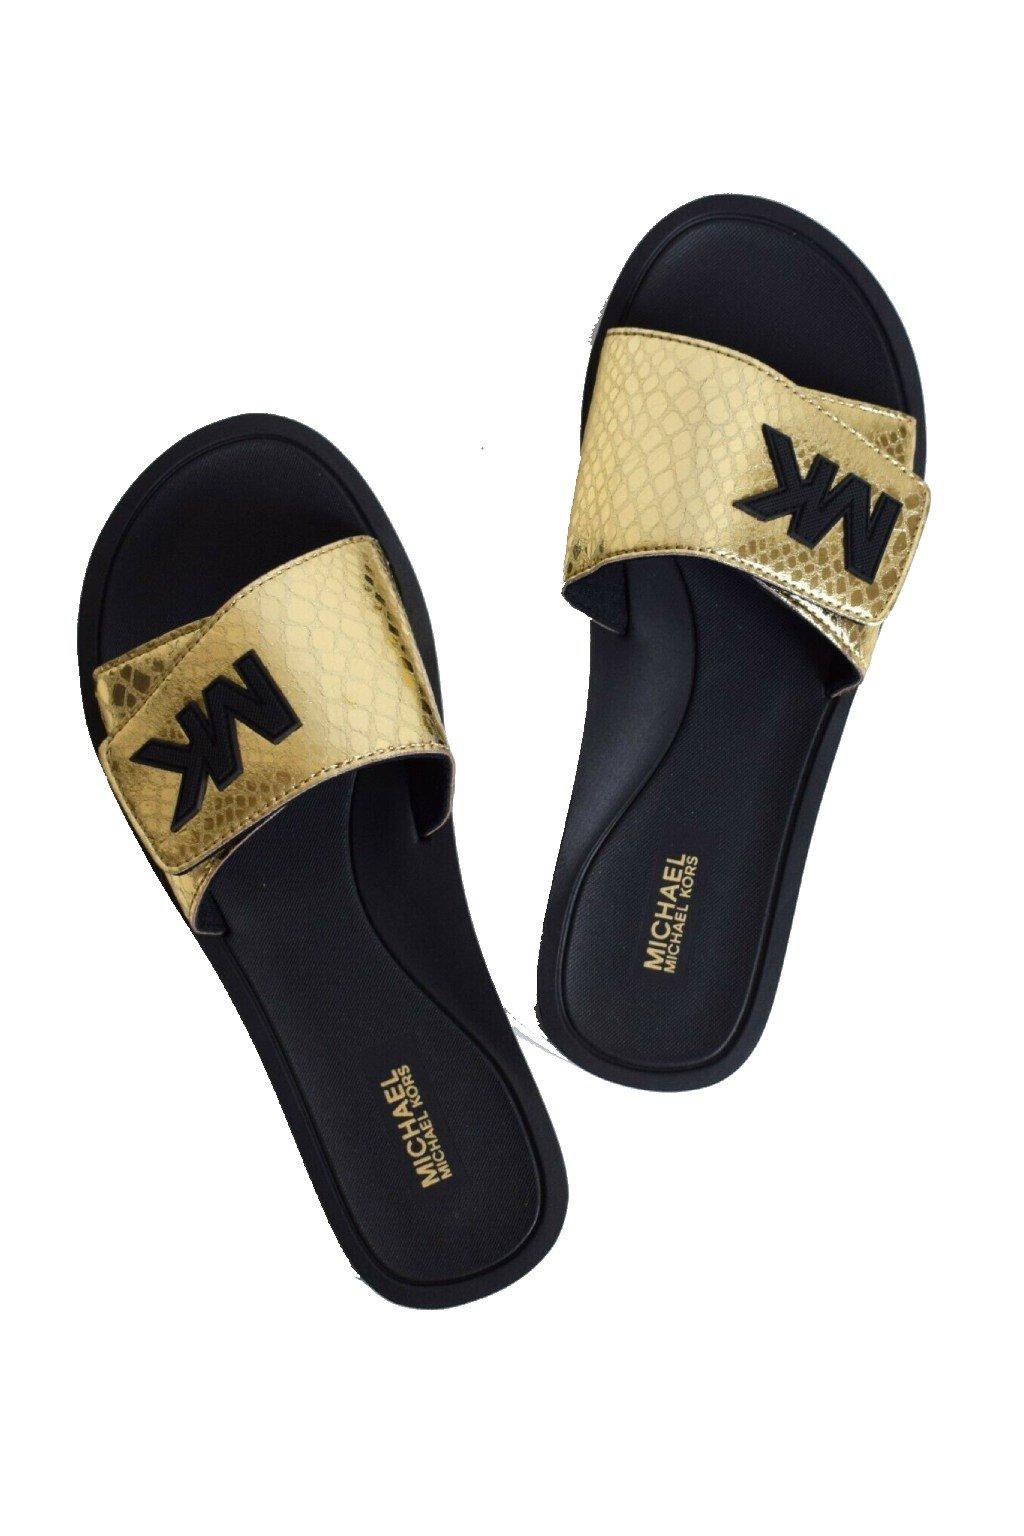 Cerno zlate pantofle Michael Kors kozene pantofle damske Michael Kors nazouvaky Calvin Klein Brno Michael kors zabky pantofle replay slevovy kod zalando Luxusni pantofle Hermes nadherne damske pantofle erikafashion (1)